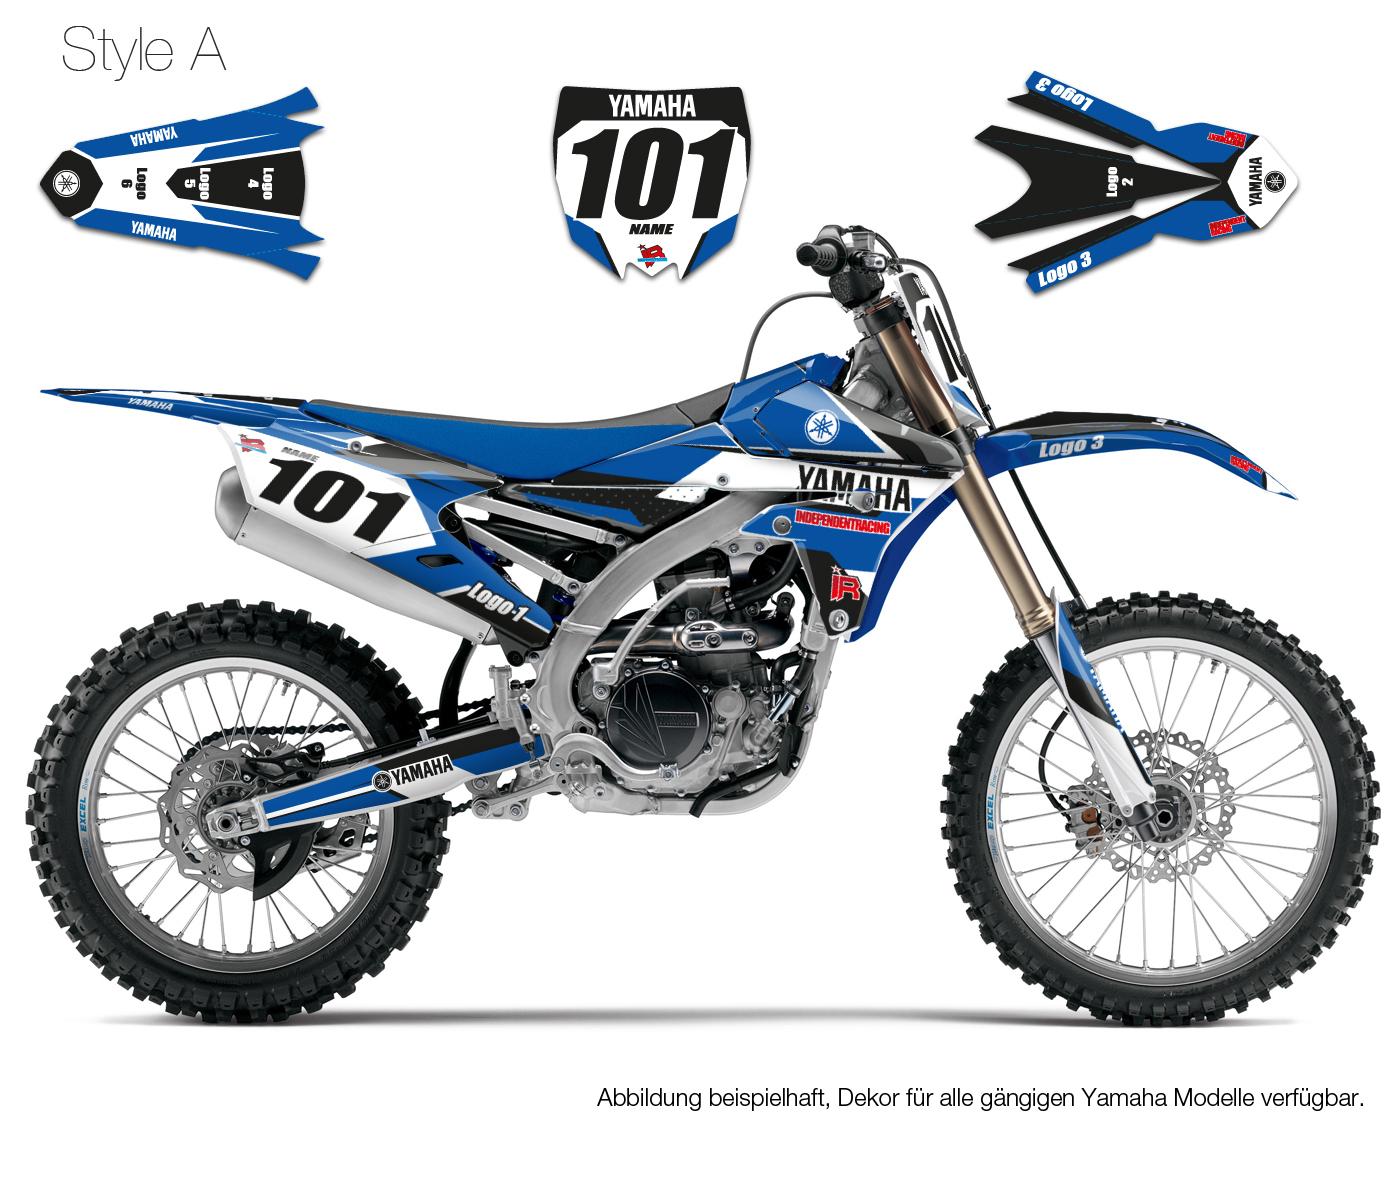 Dekor Yamaha Stock2